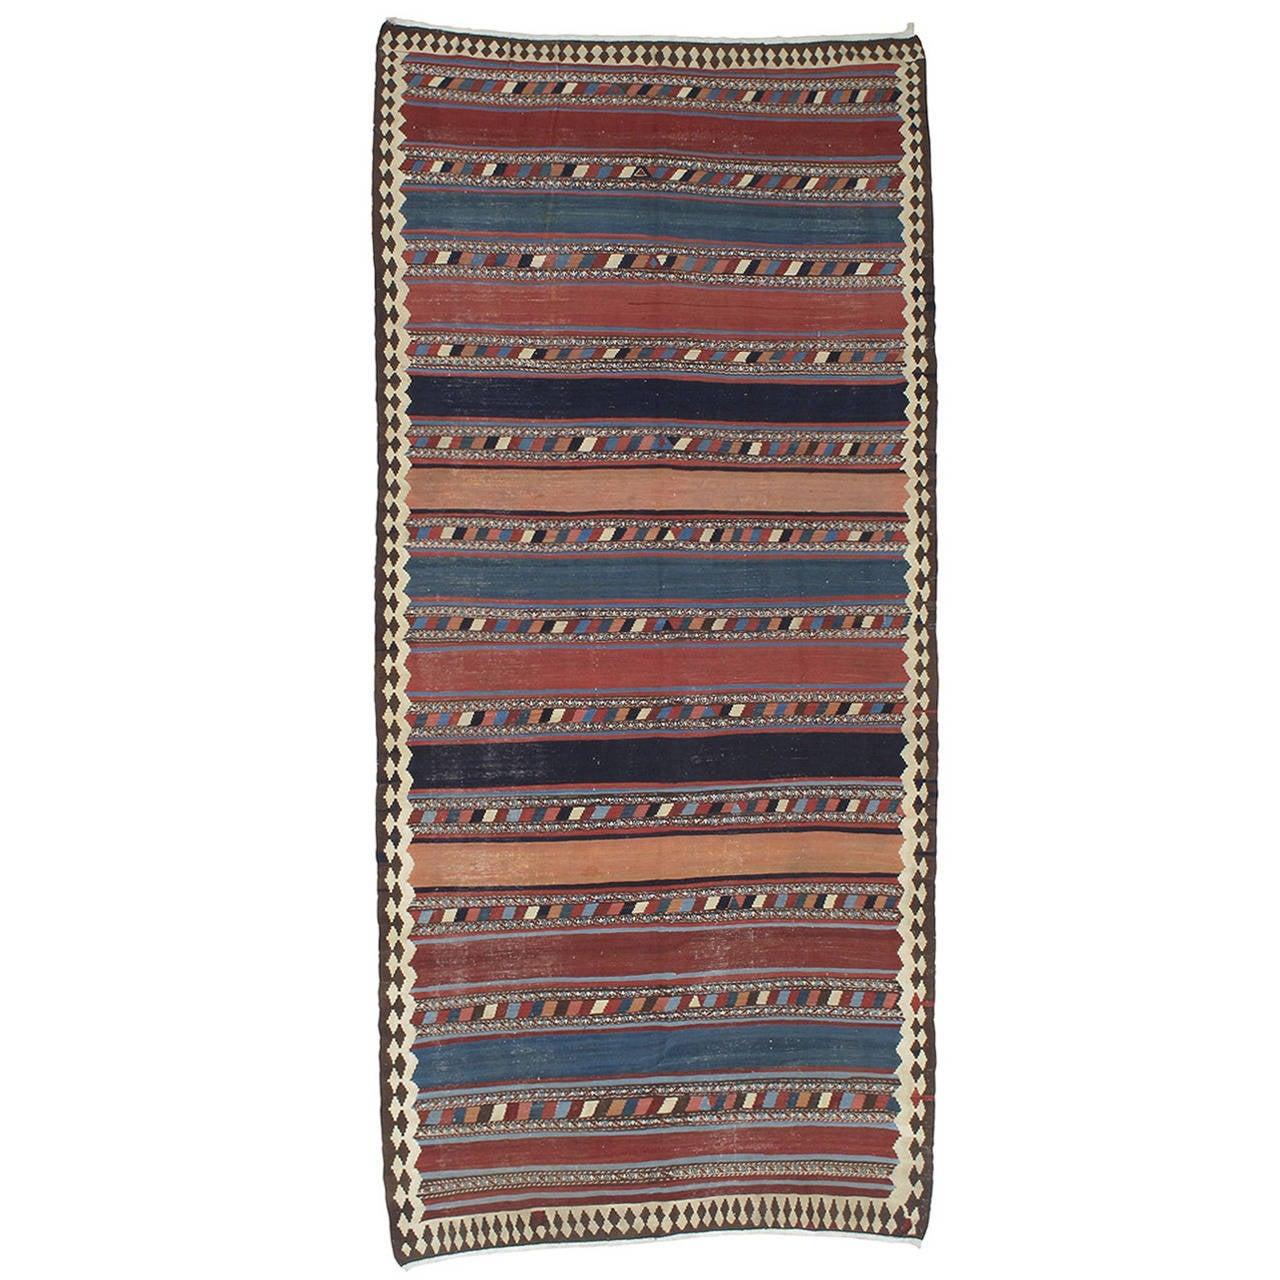 Antique Shahsavan Kilim Rug For Sale